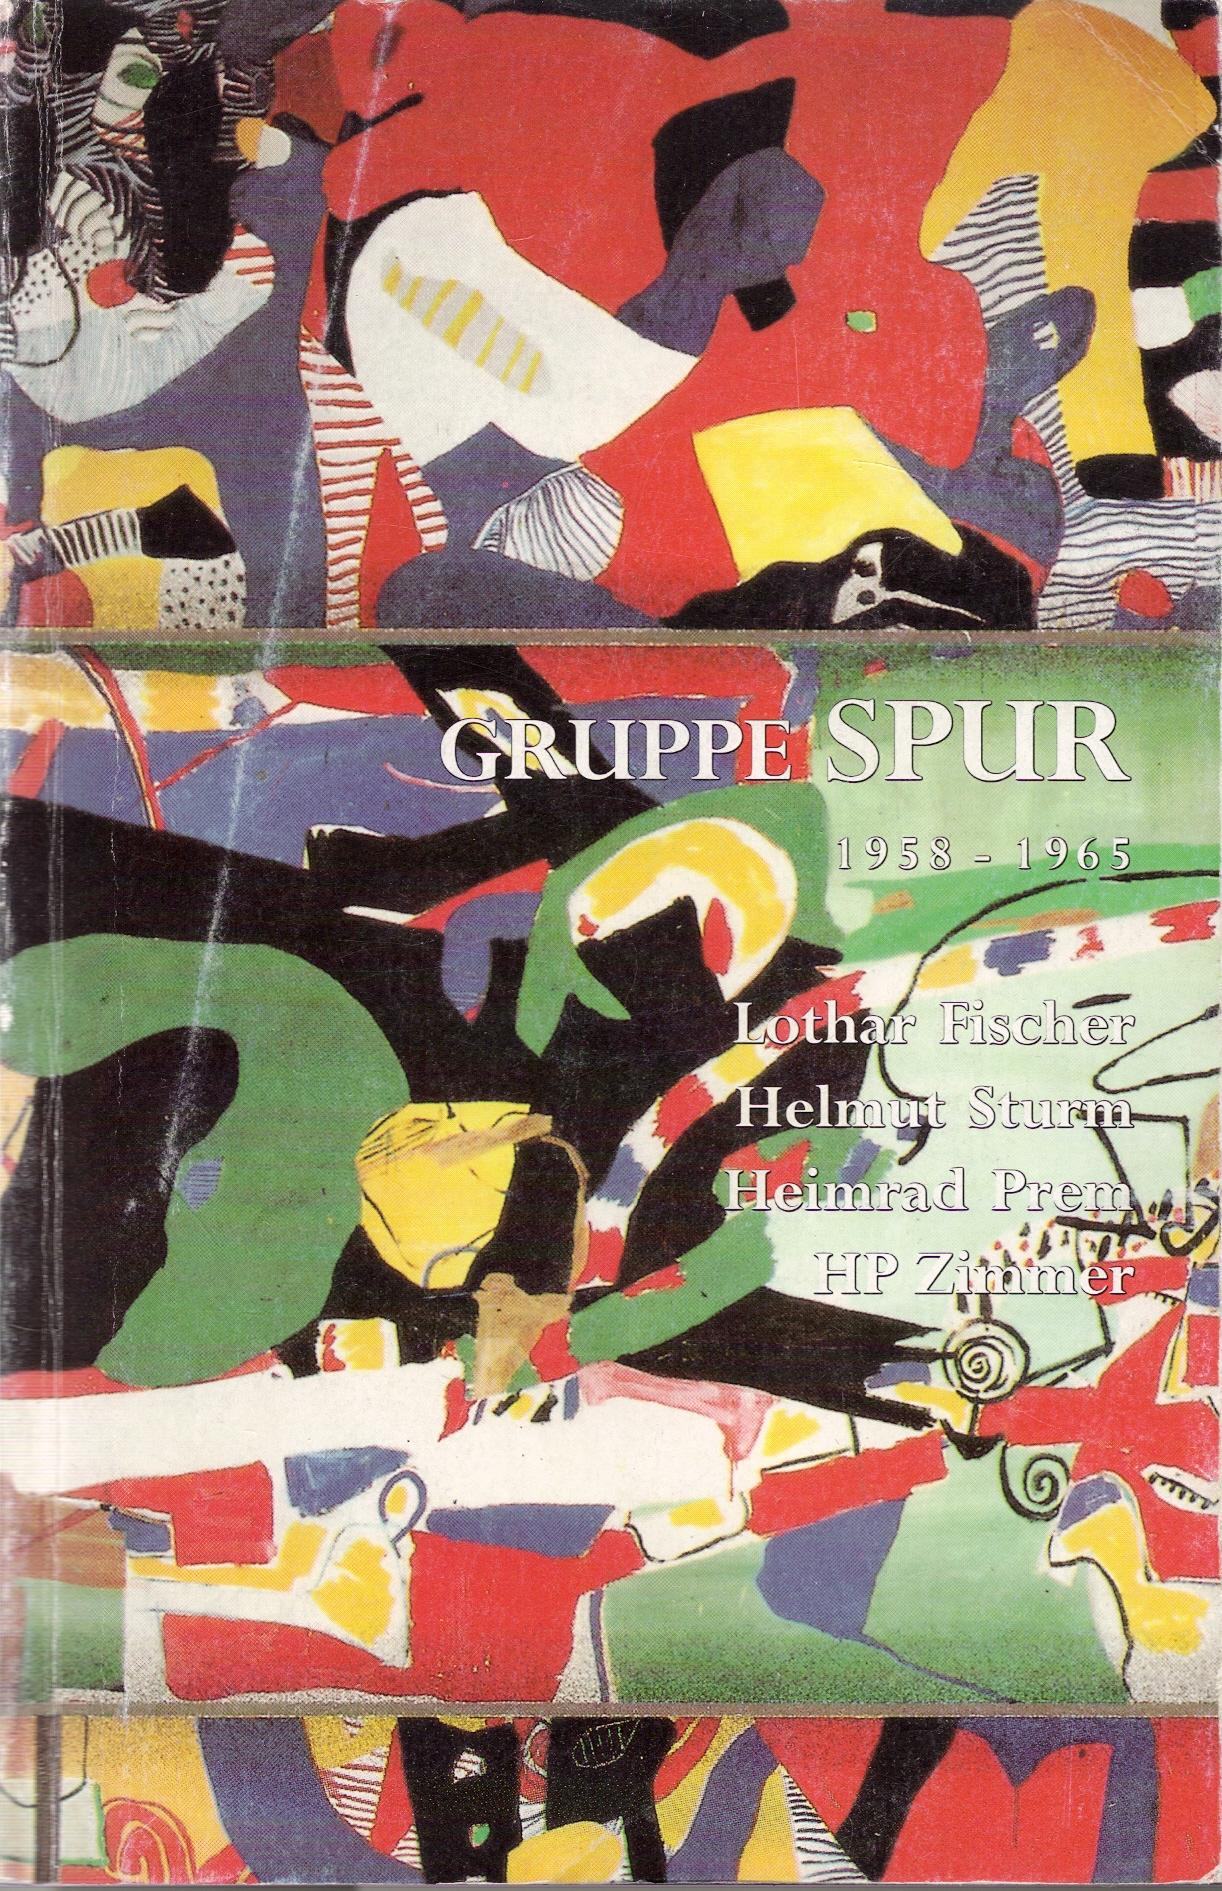 Gruppe SPUR, 1991